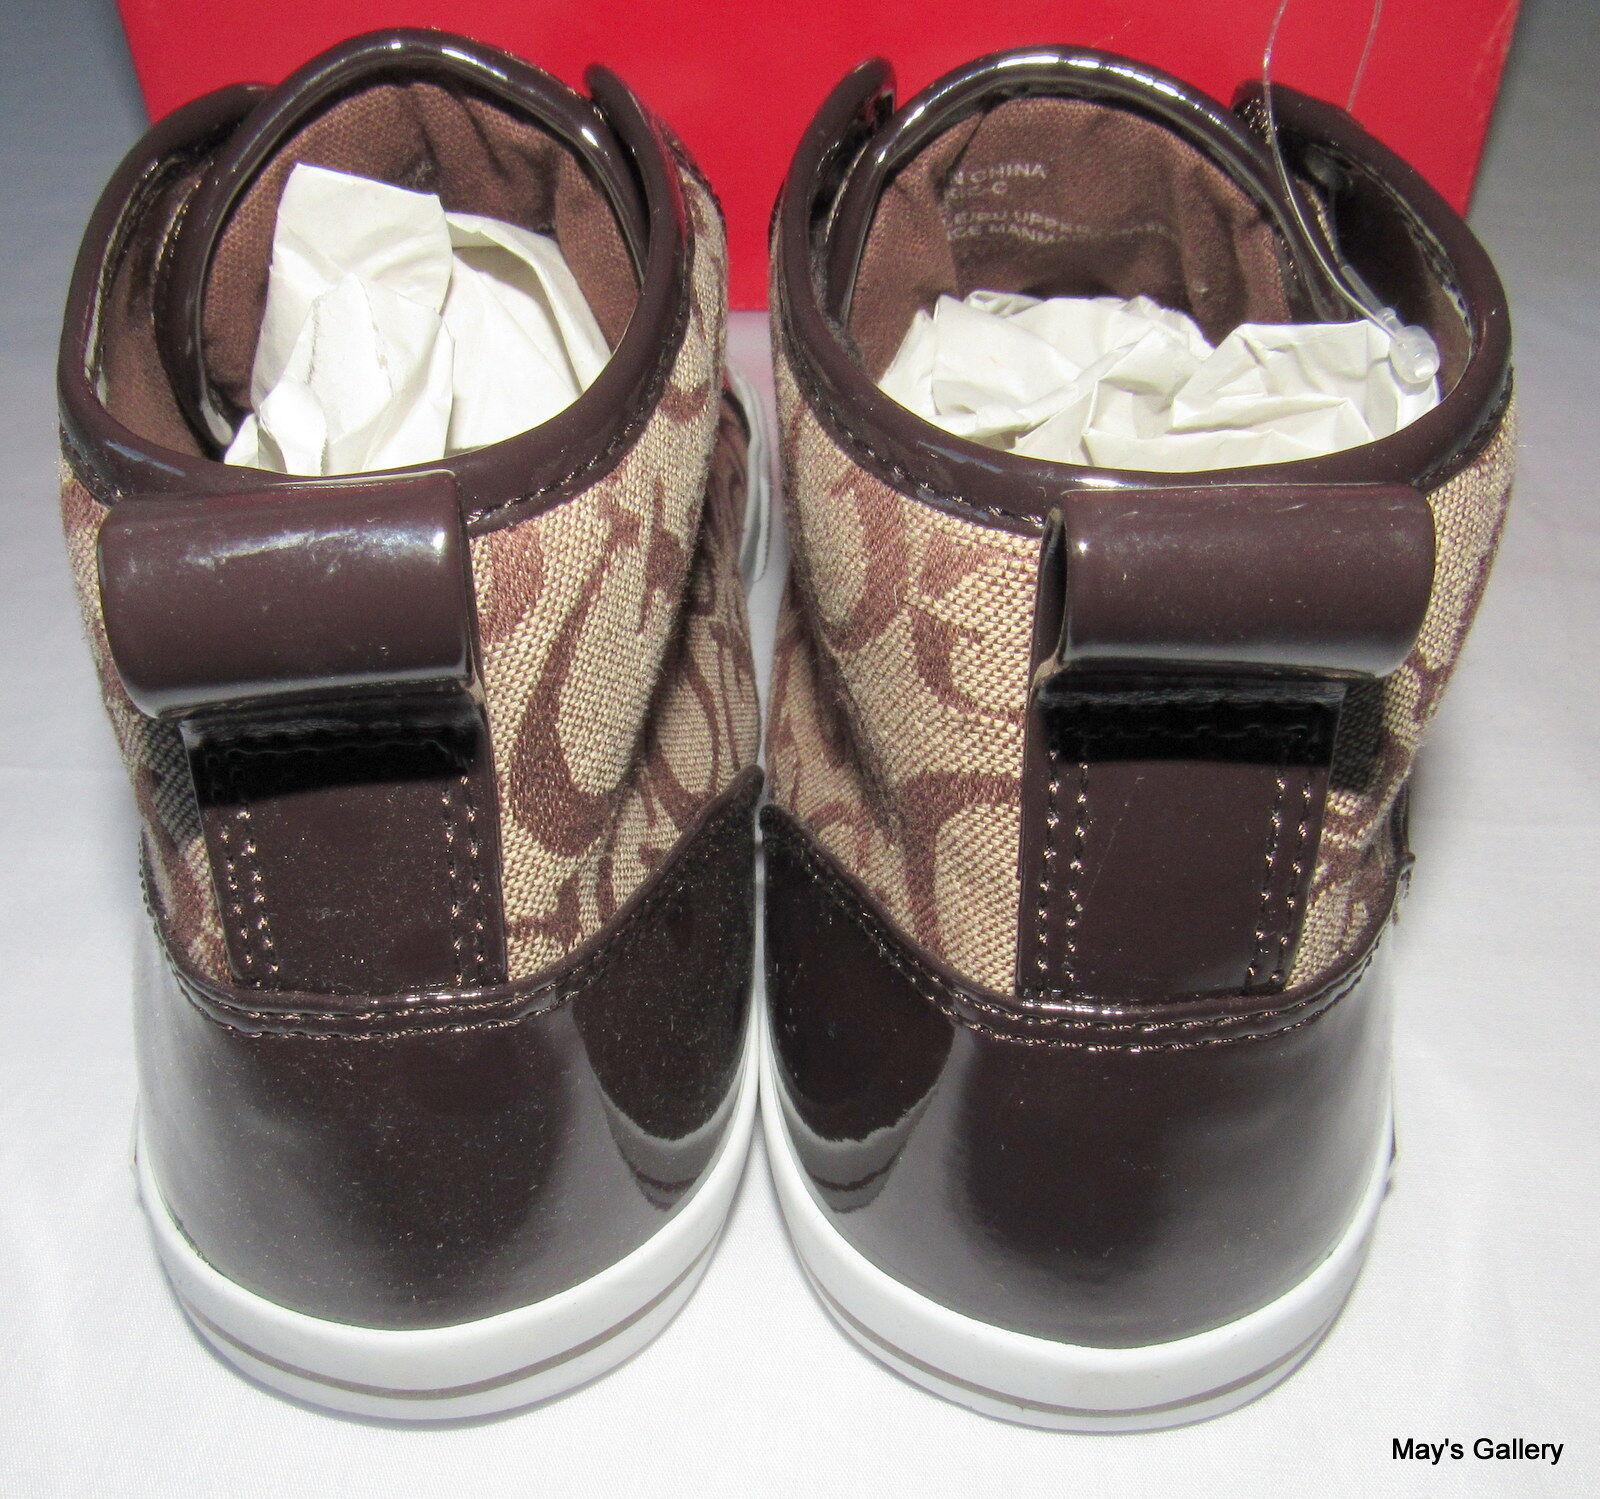 GUESS Sneaker High Top Schuhes Sport Athletic Walking Schuhe Schuhes Top Flip Flop NIB Sz 8 c322b6